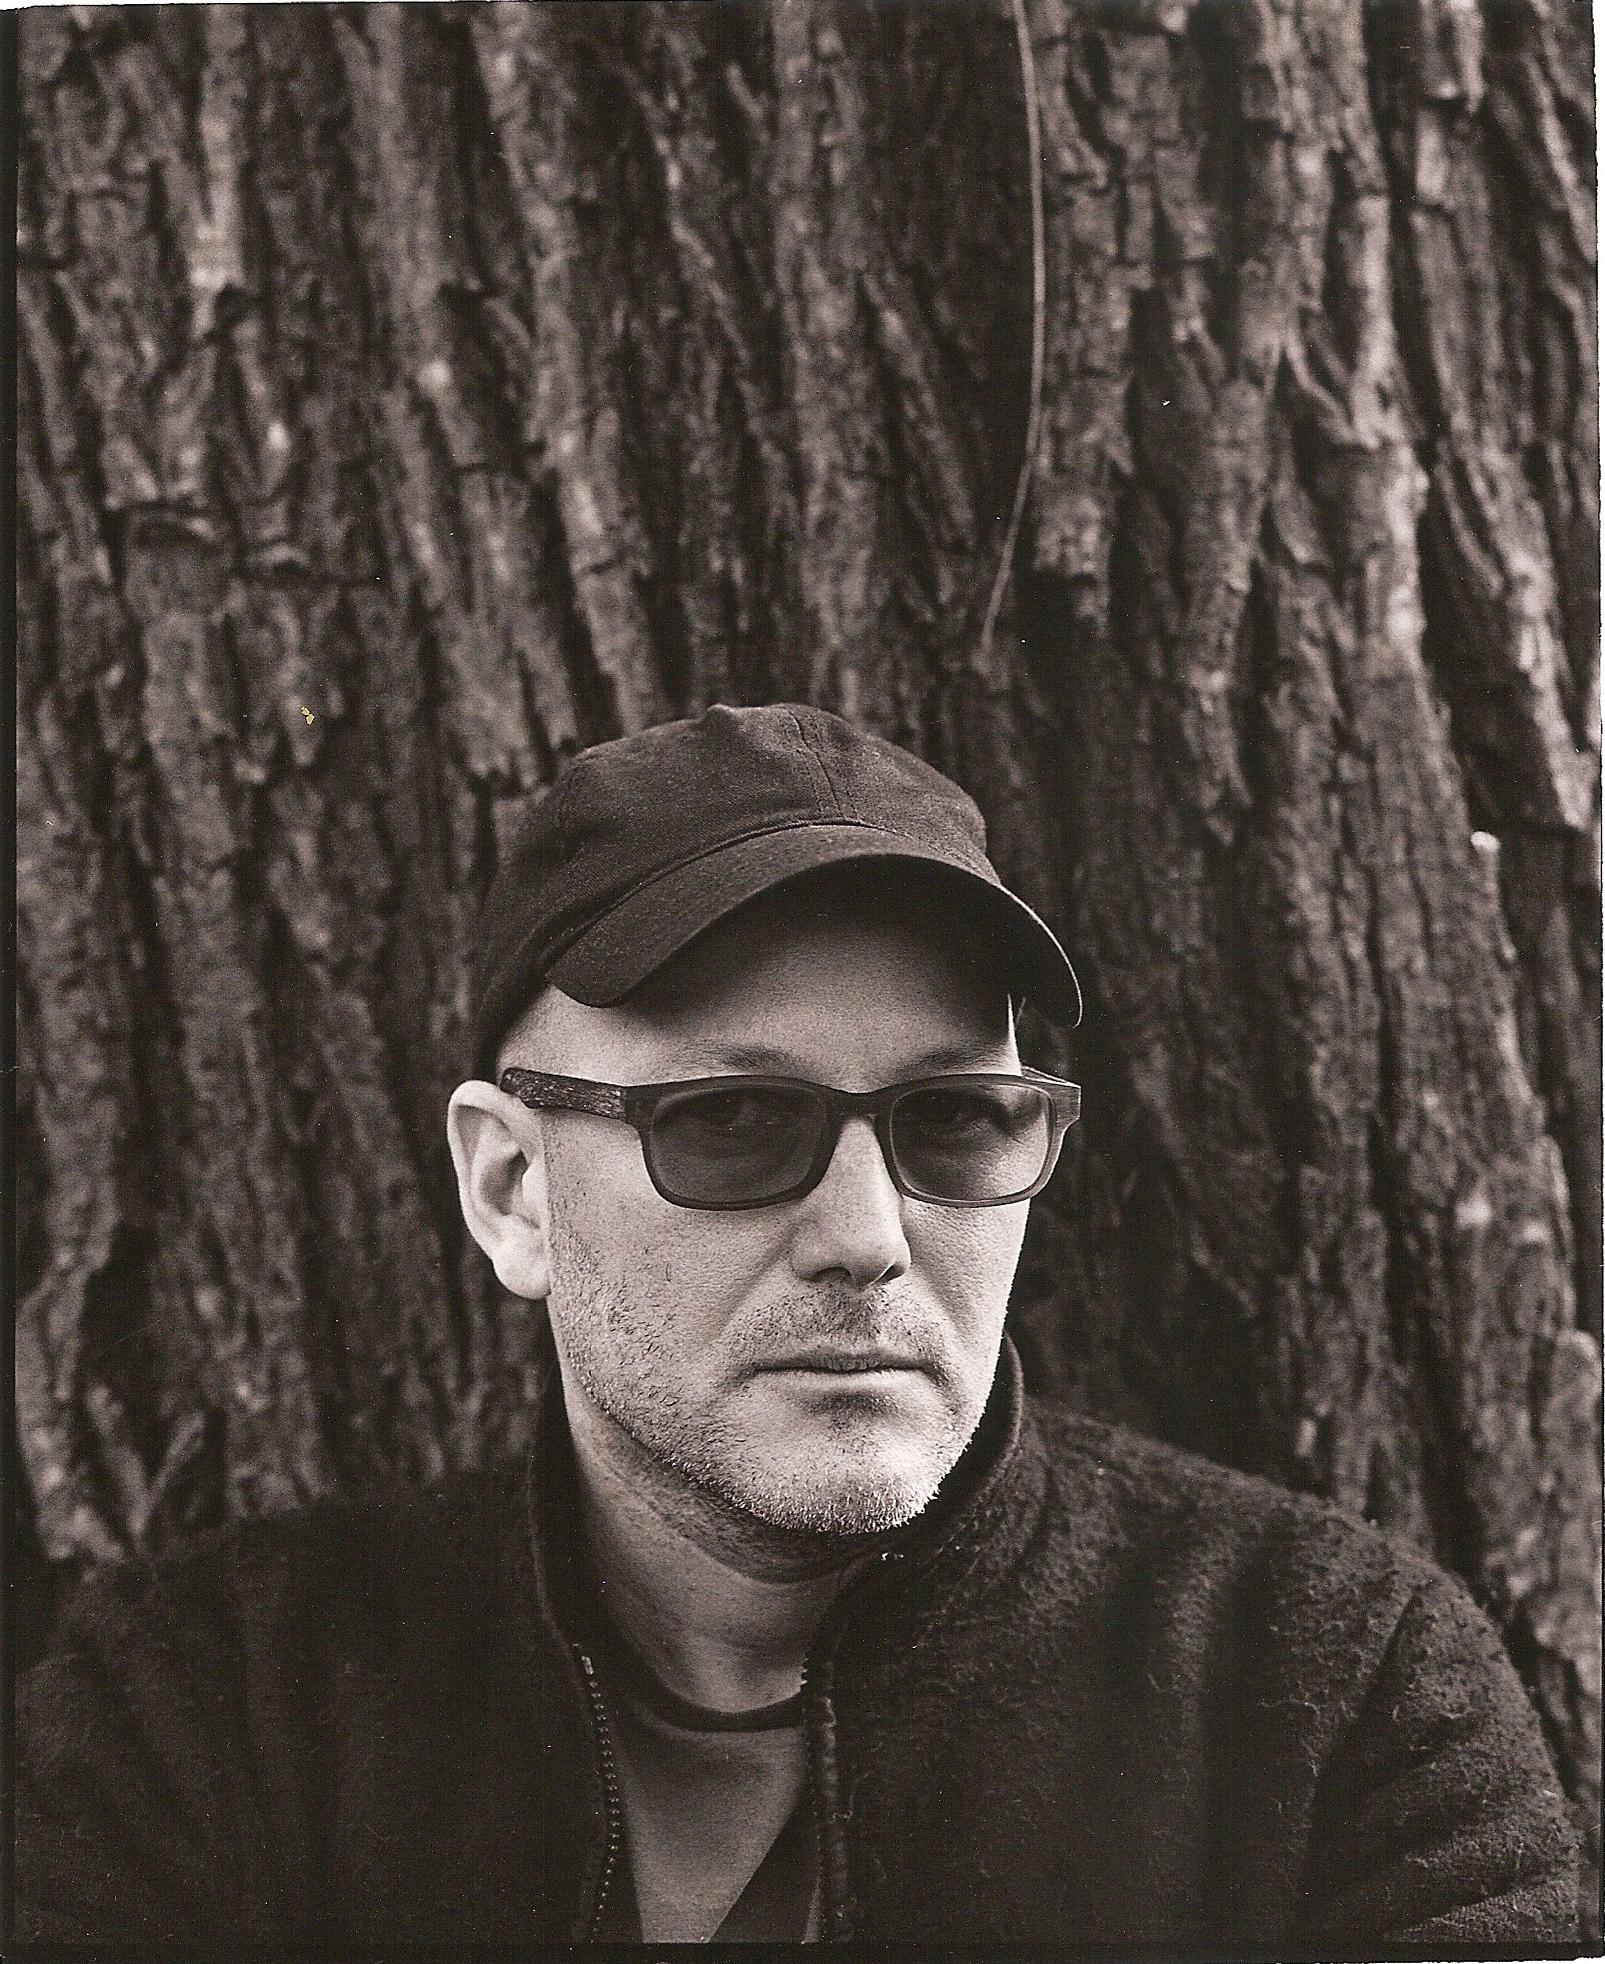 Bill Morrison, Credit - Wolfgang Wesener